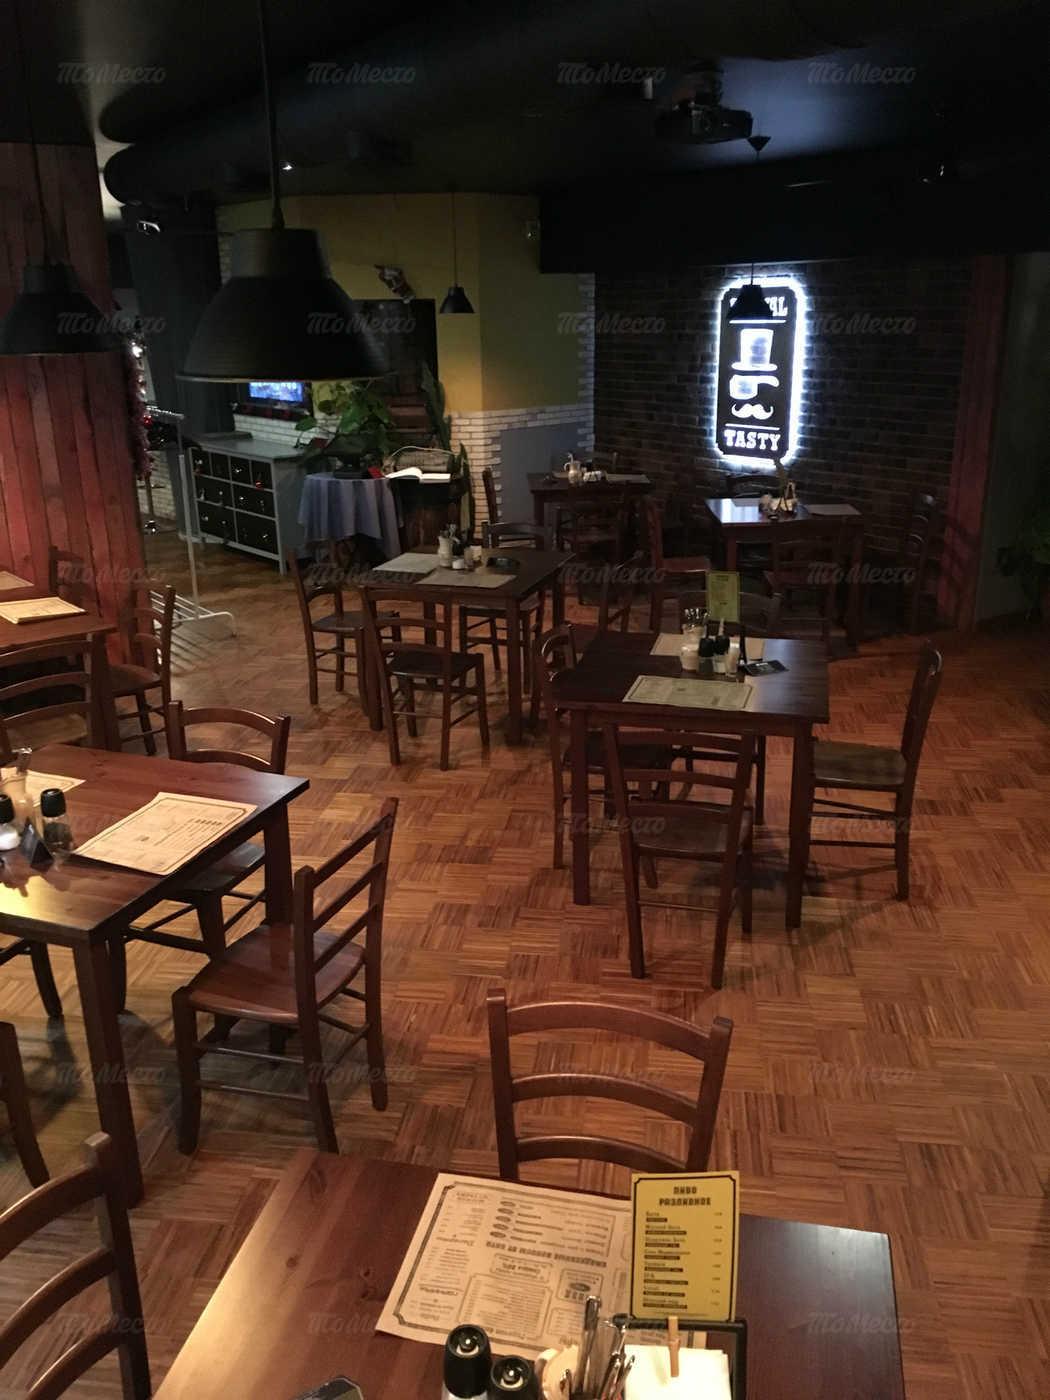 Ресторан The Батя (The Batya) на набережной реки Фонтанки фото 2